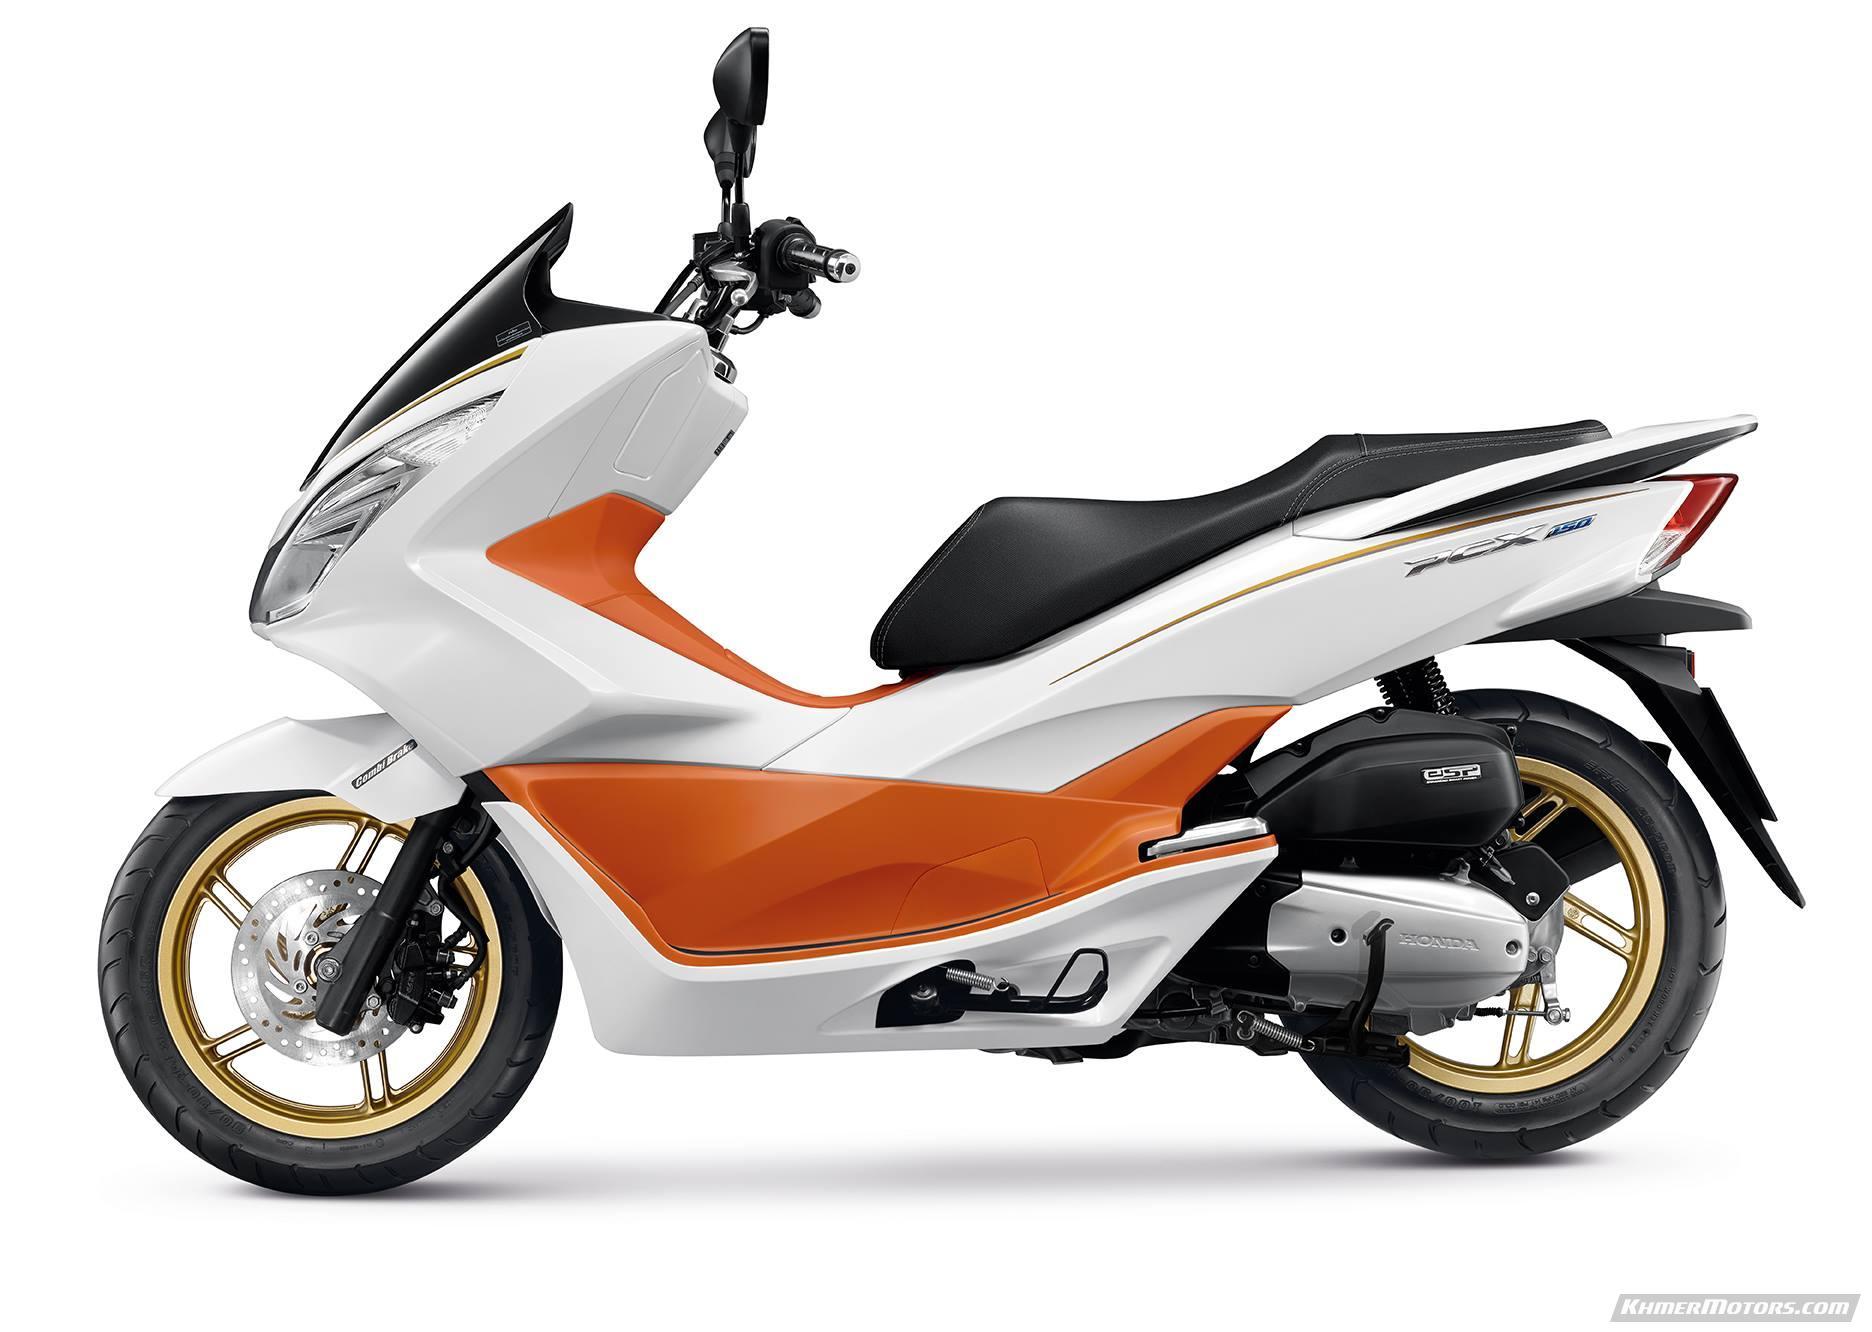 kong pearl macau en motorcycle hong honda jasmine white pcx scooter